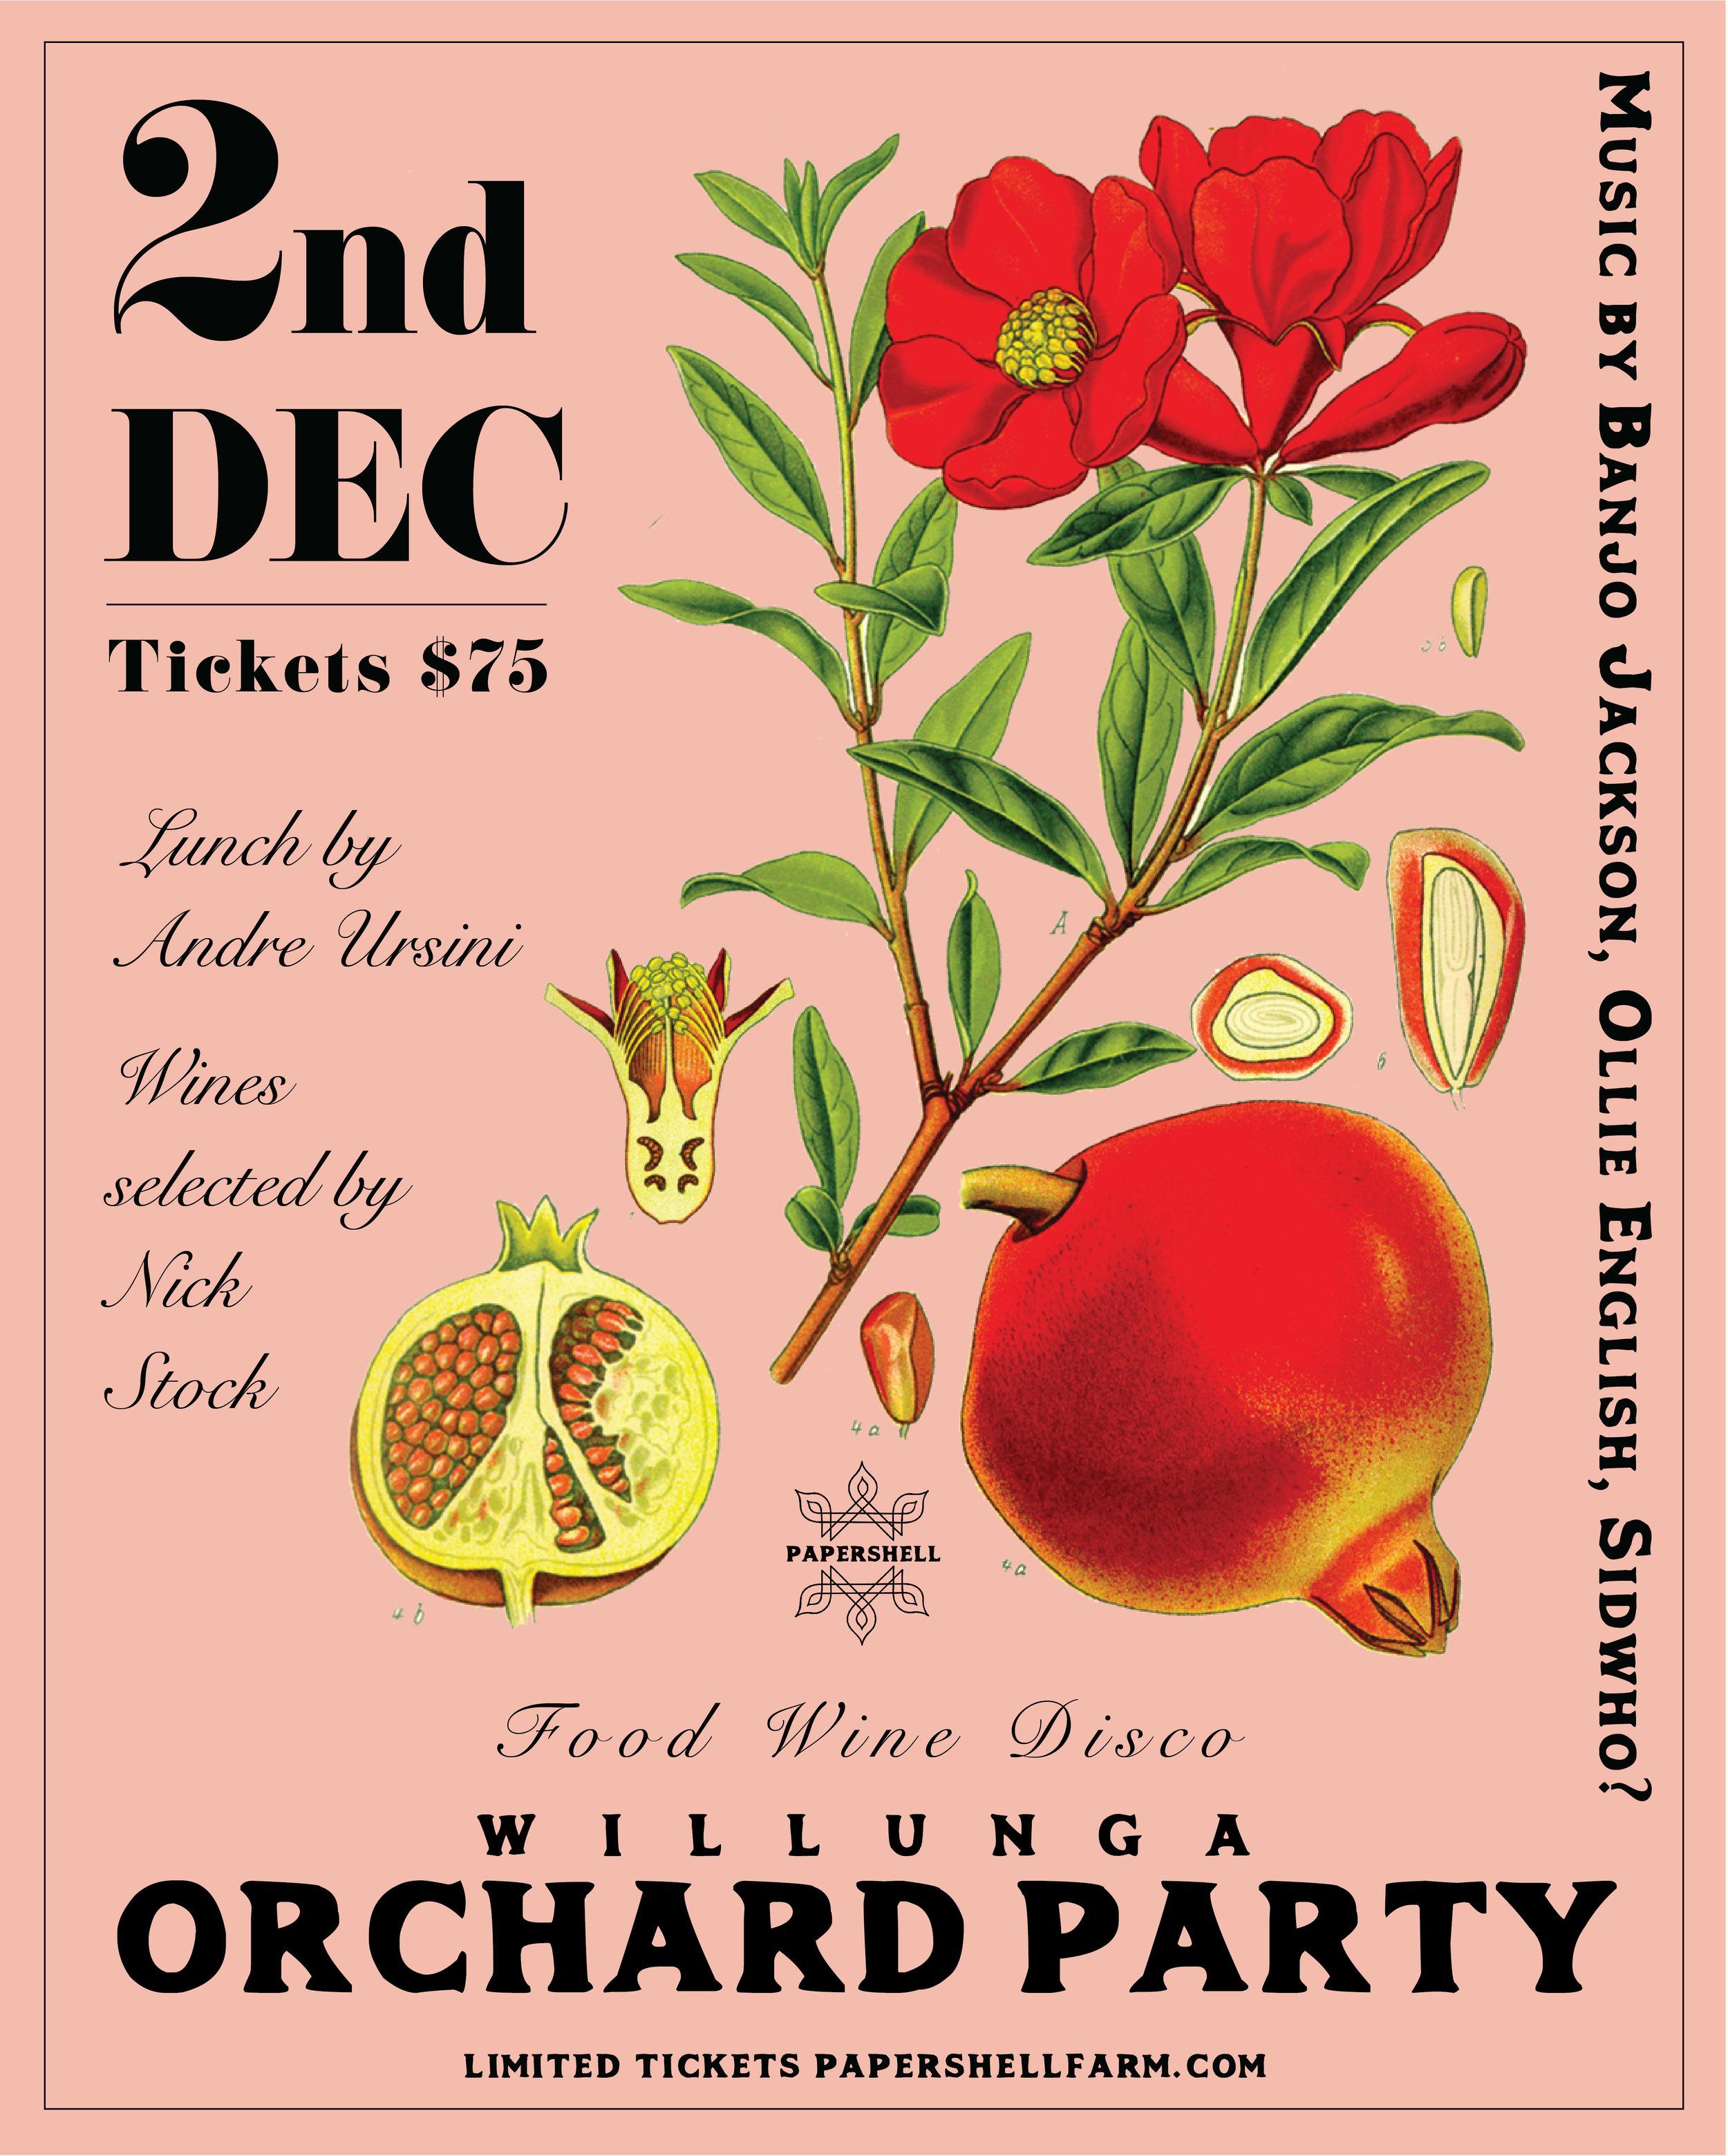 OrchardPartyFlyer_Insta_FINAL RBG-01.jpg